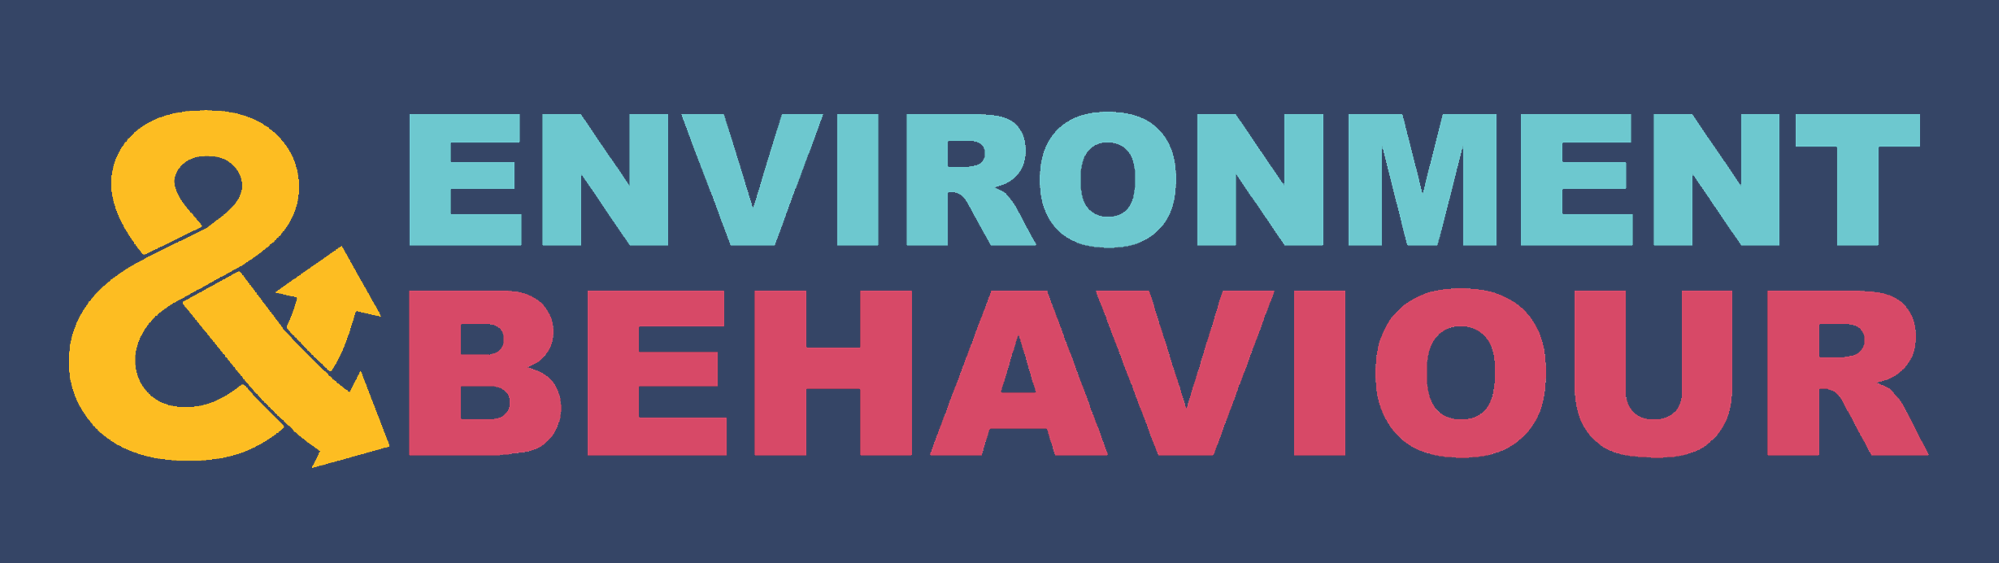 Environment and Behaviour Hub logo